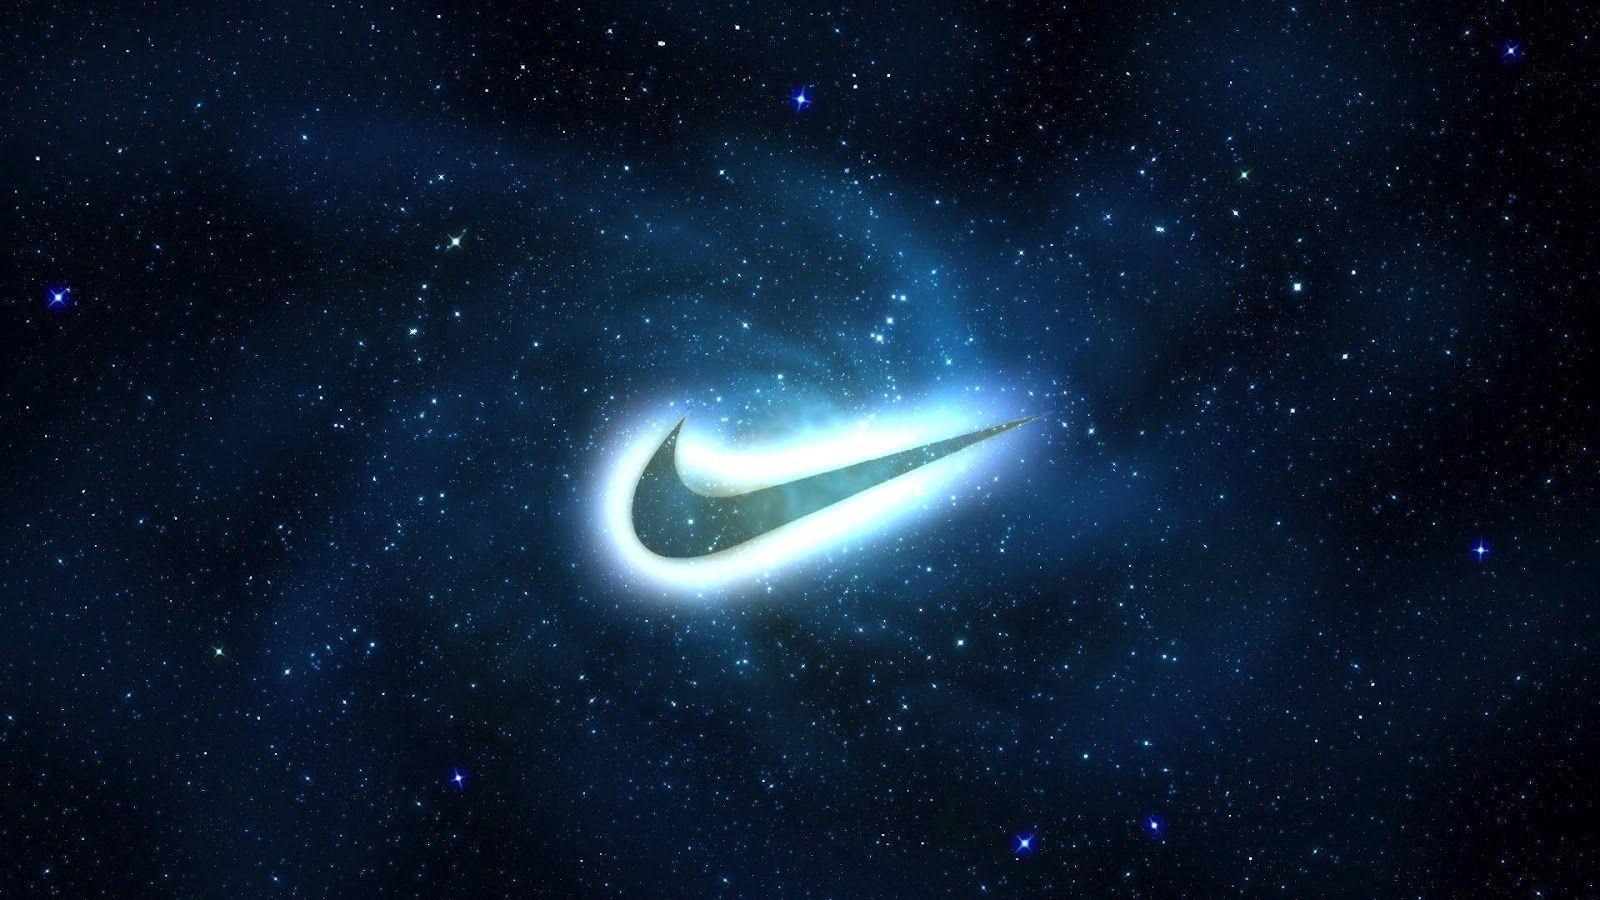 Nike Wallpapers For Desktop